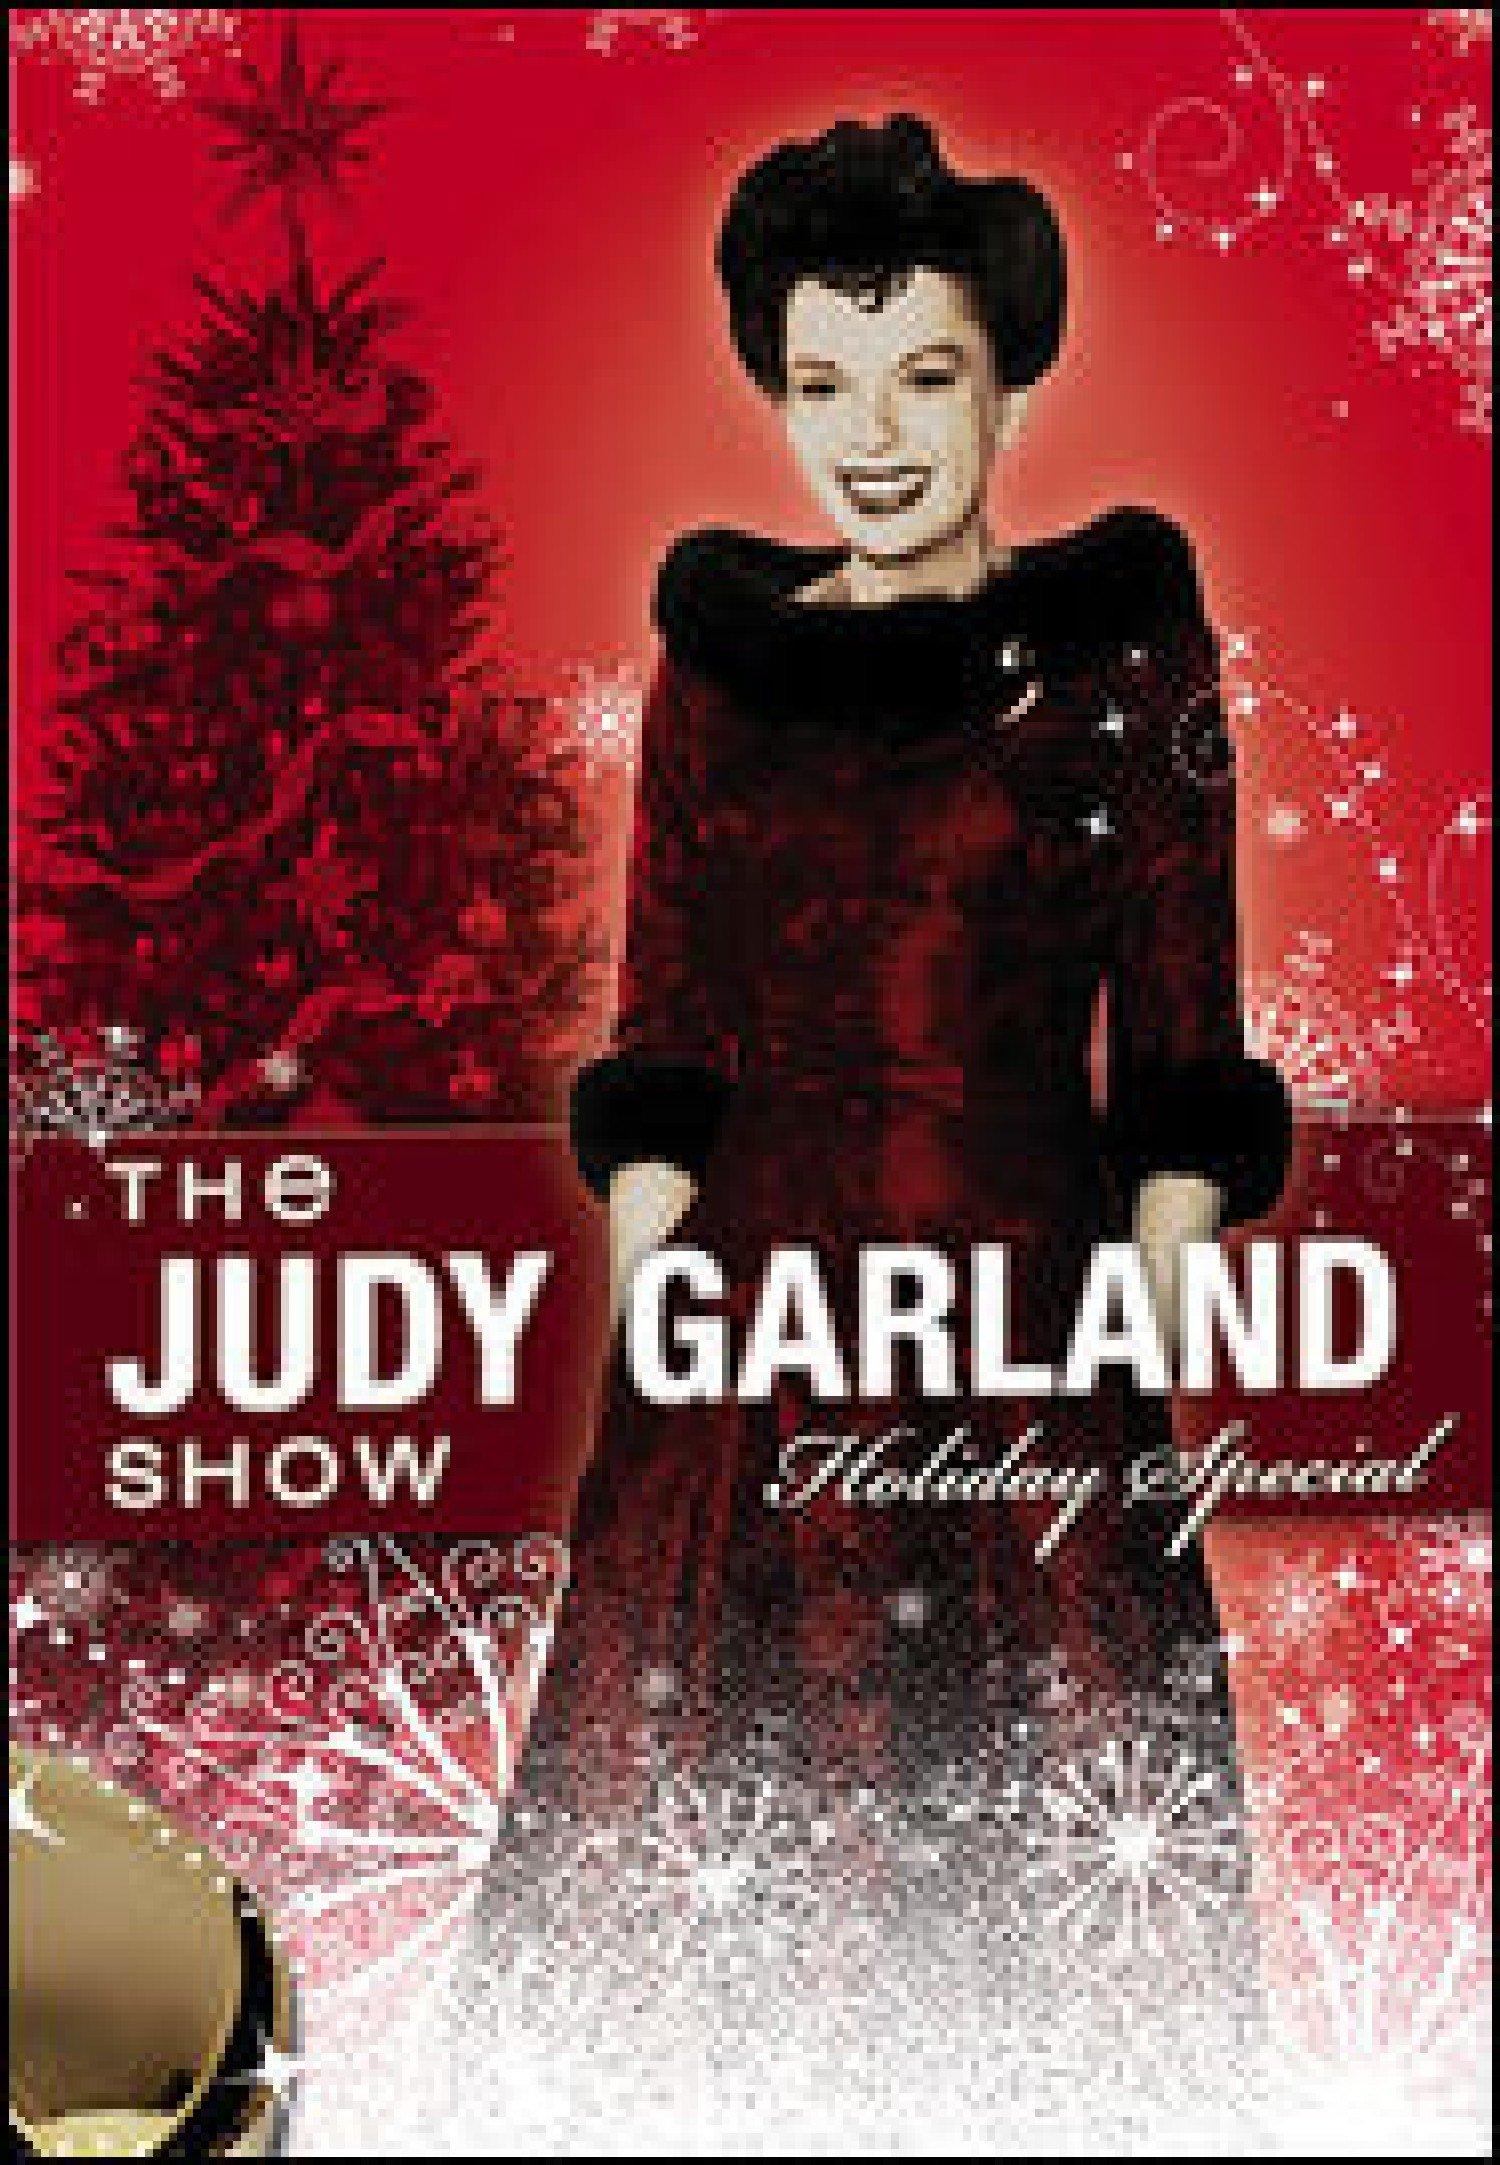 Judy Garland Holiday Special by Garland, Judy